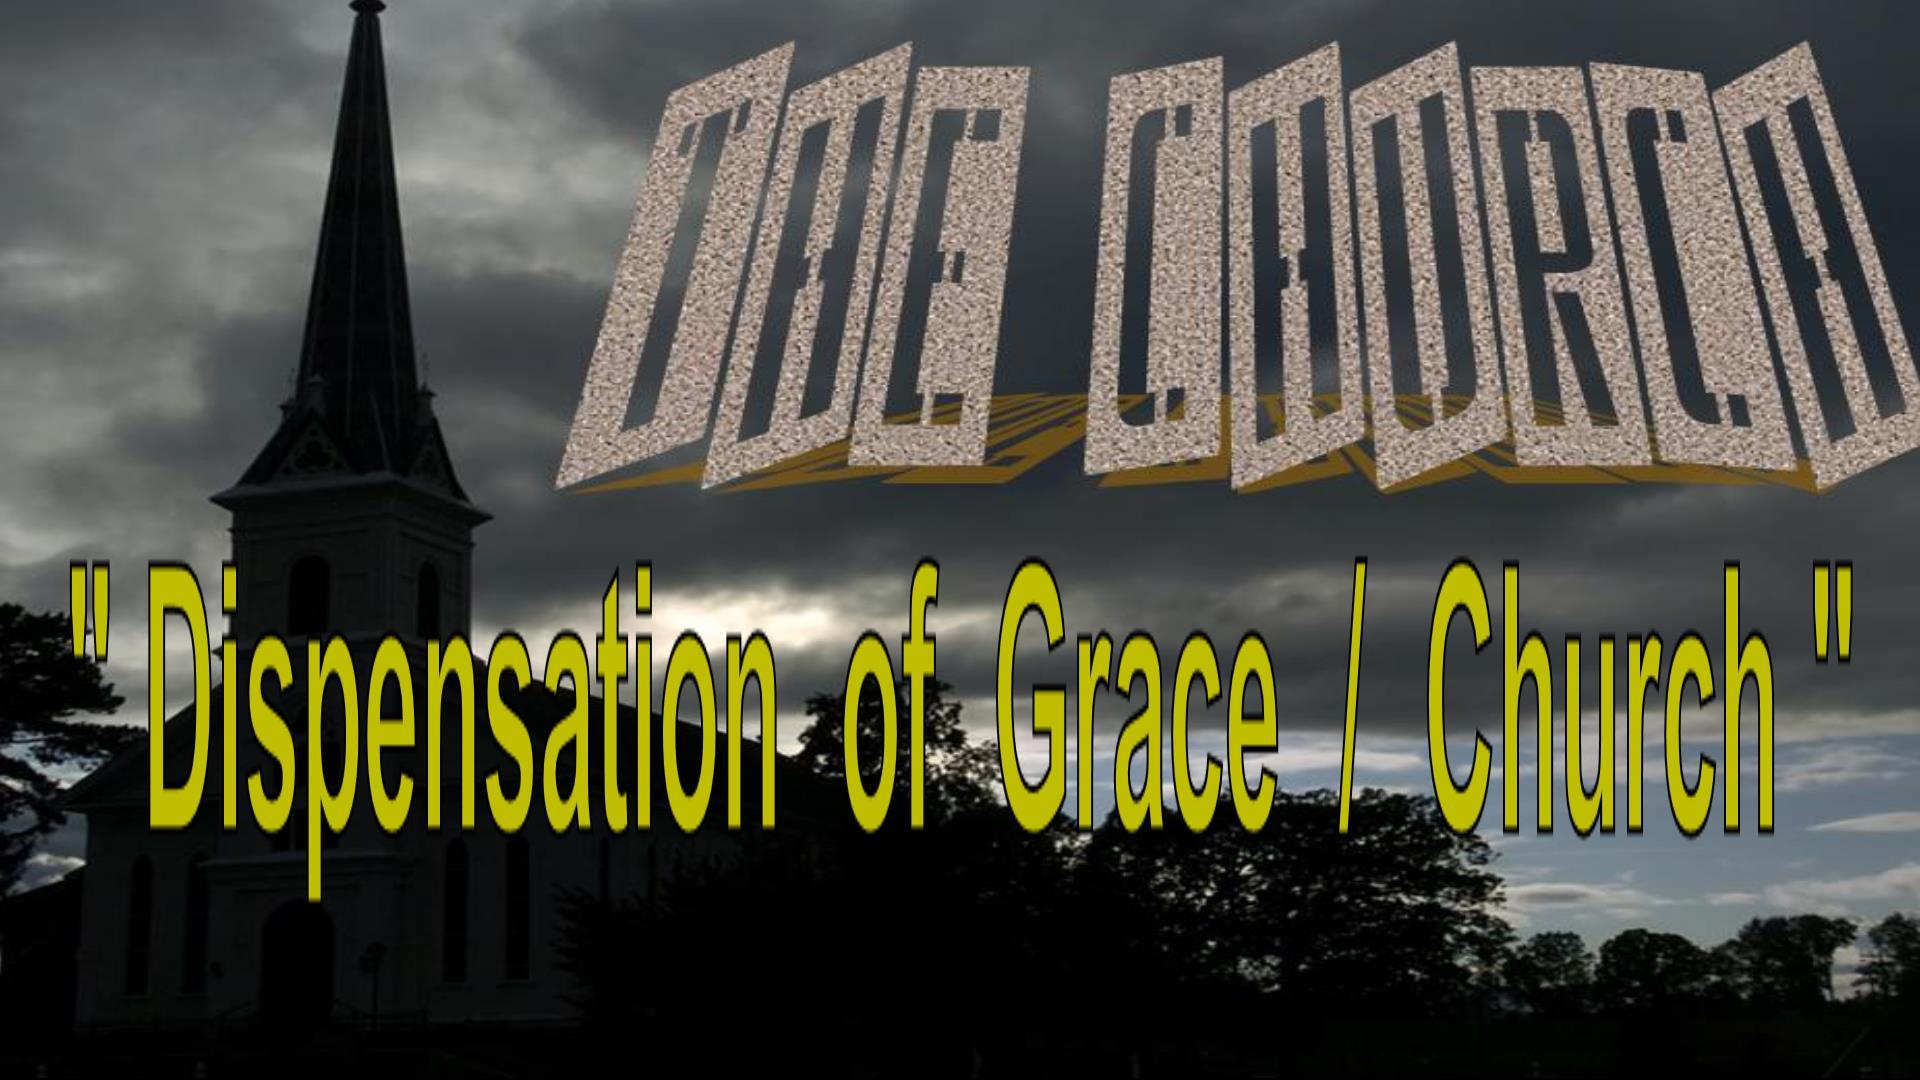 Dispensation of Grace/Church